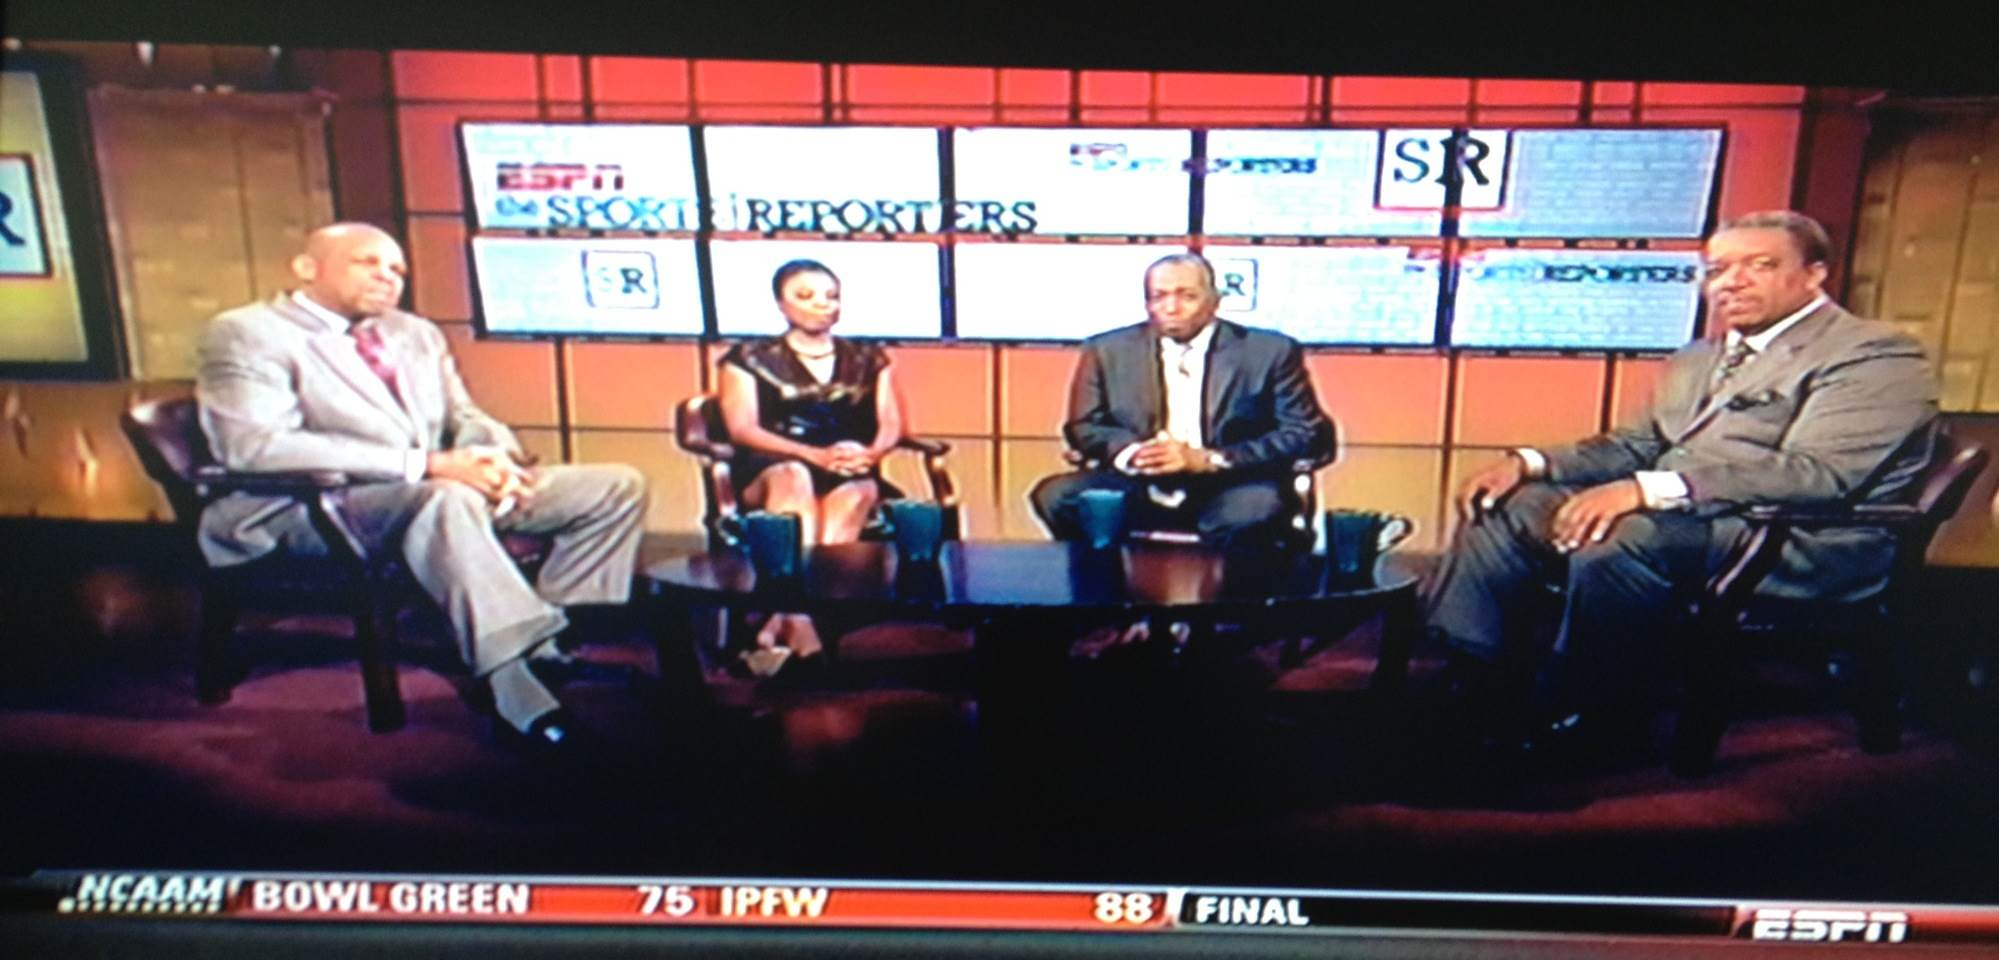 """The Sports Reporters"""" from left: William C. Rhoden; Jemele Hill (@JemeleHill); John Saunders (@JohnReporters); Bryan Burwell (@realbburwell) (Credit: Sree Sreenivasan)"